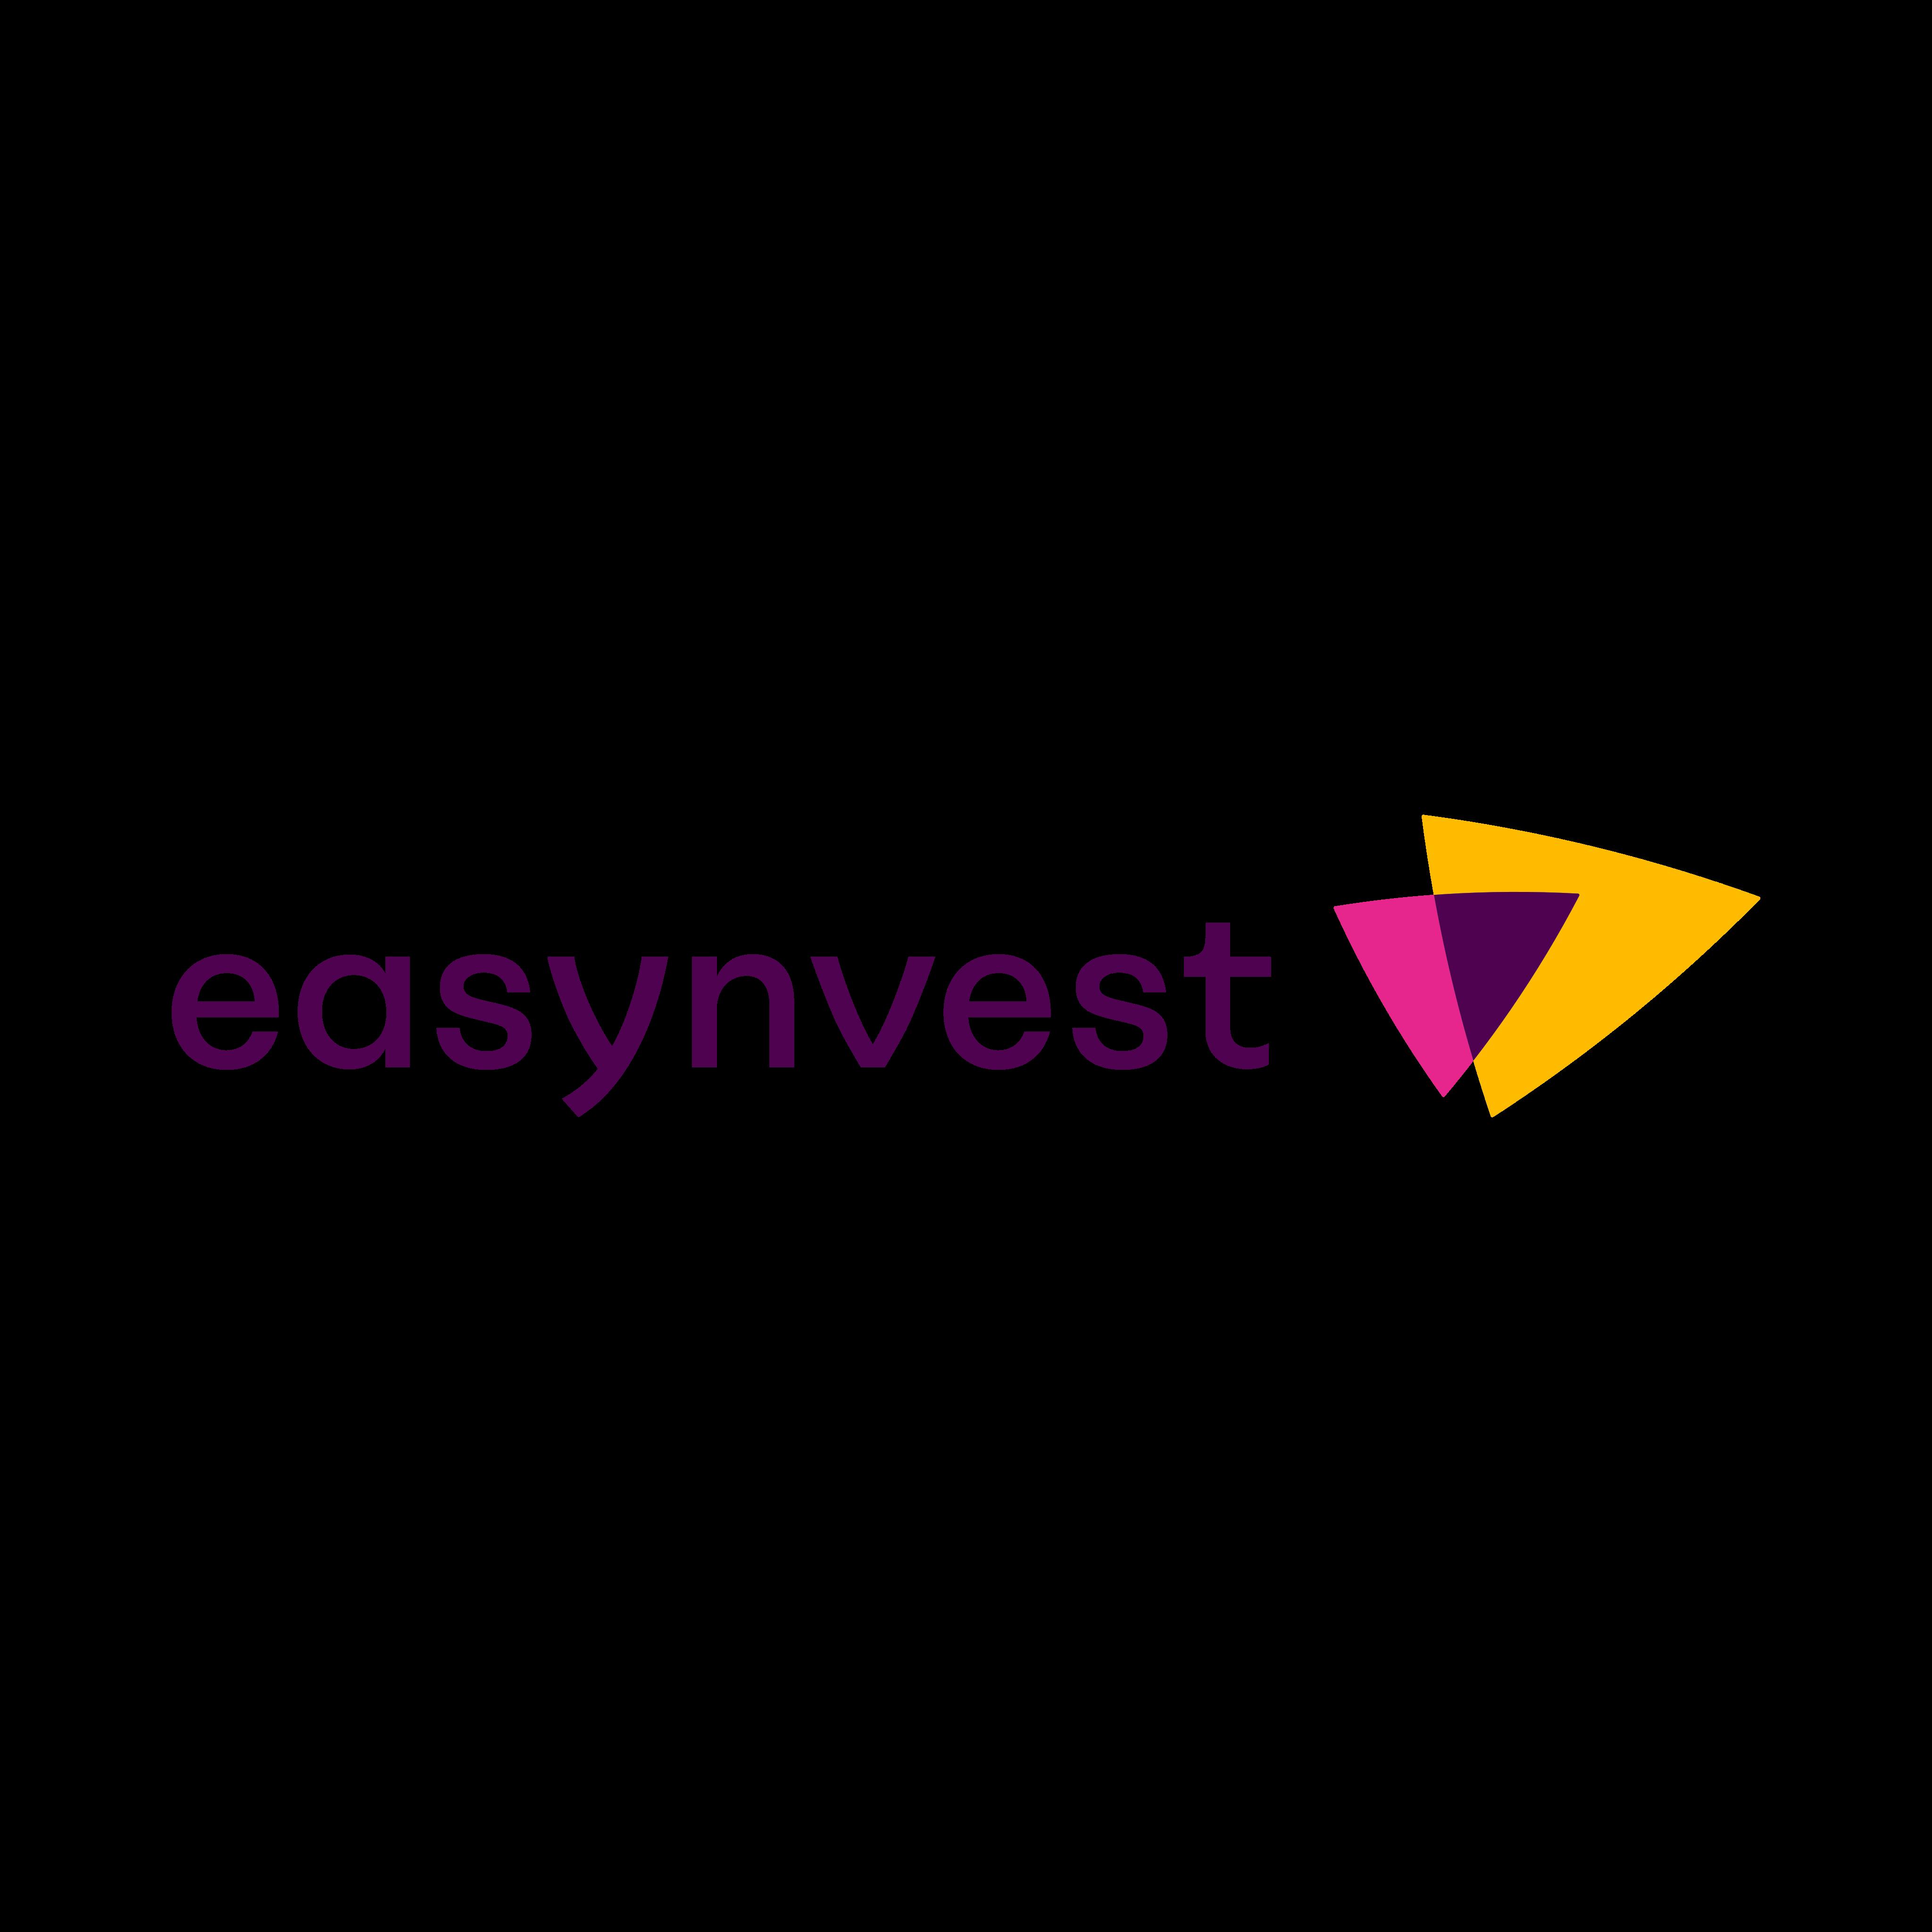 easynvest logo 0 - Easynvest Logo